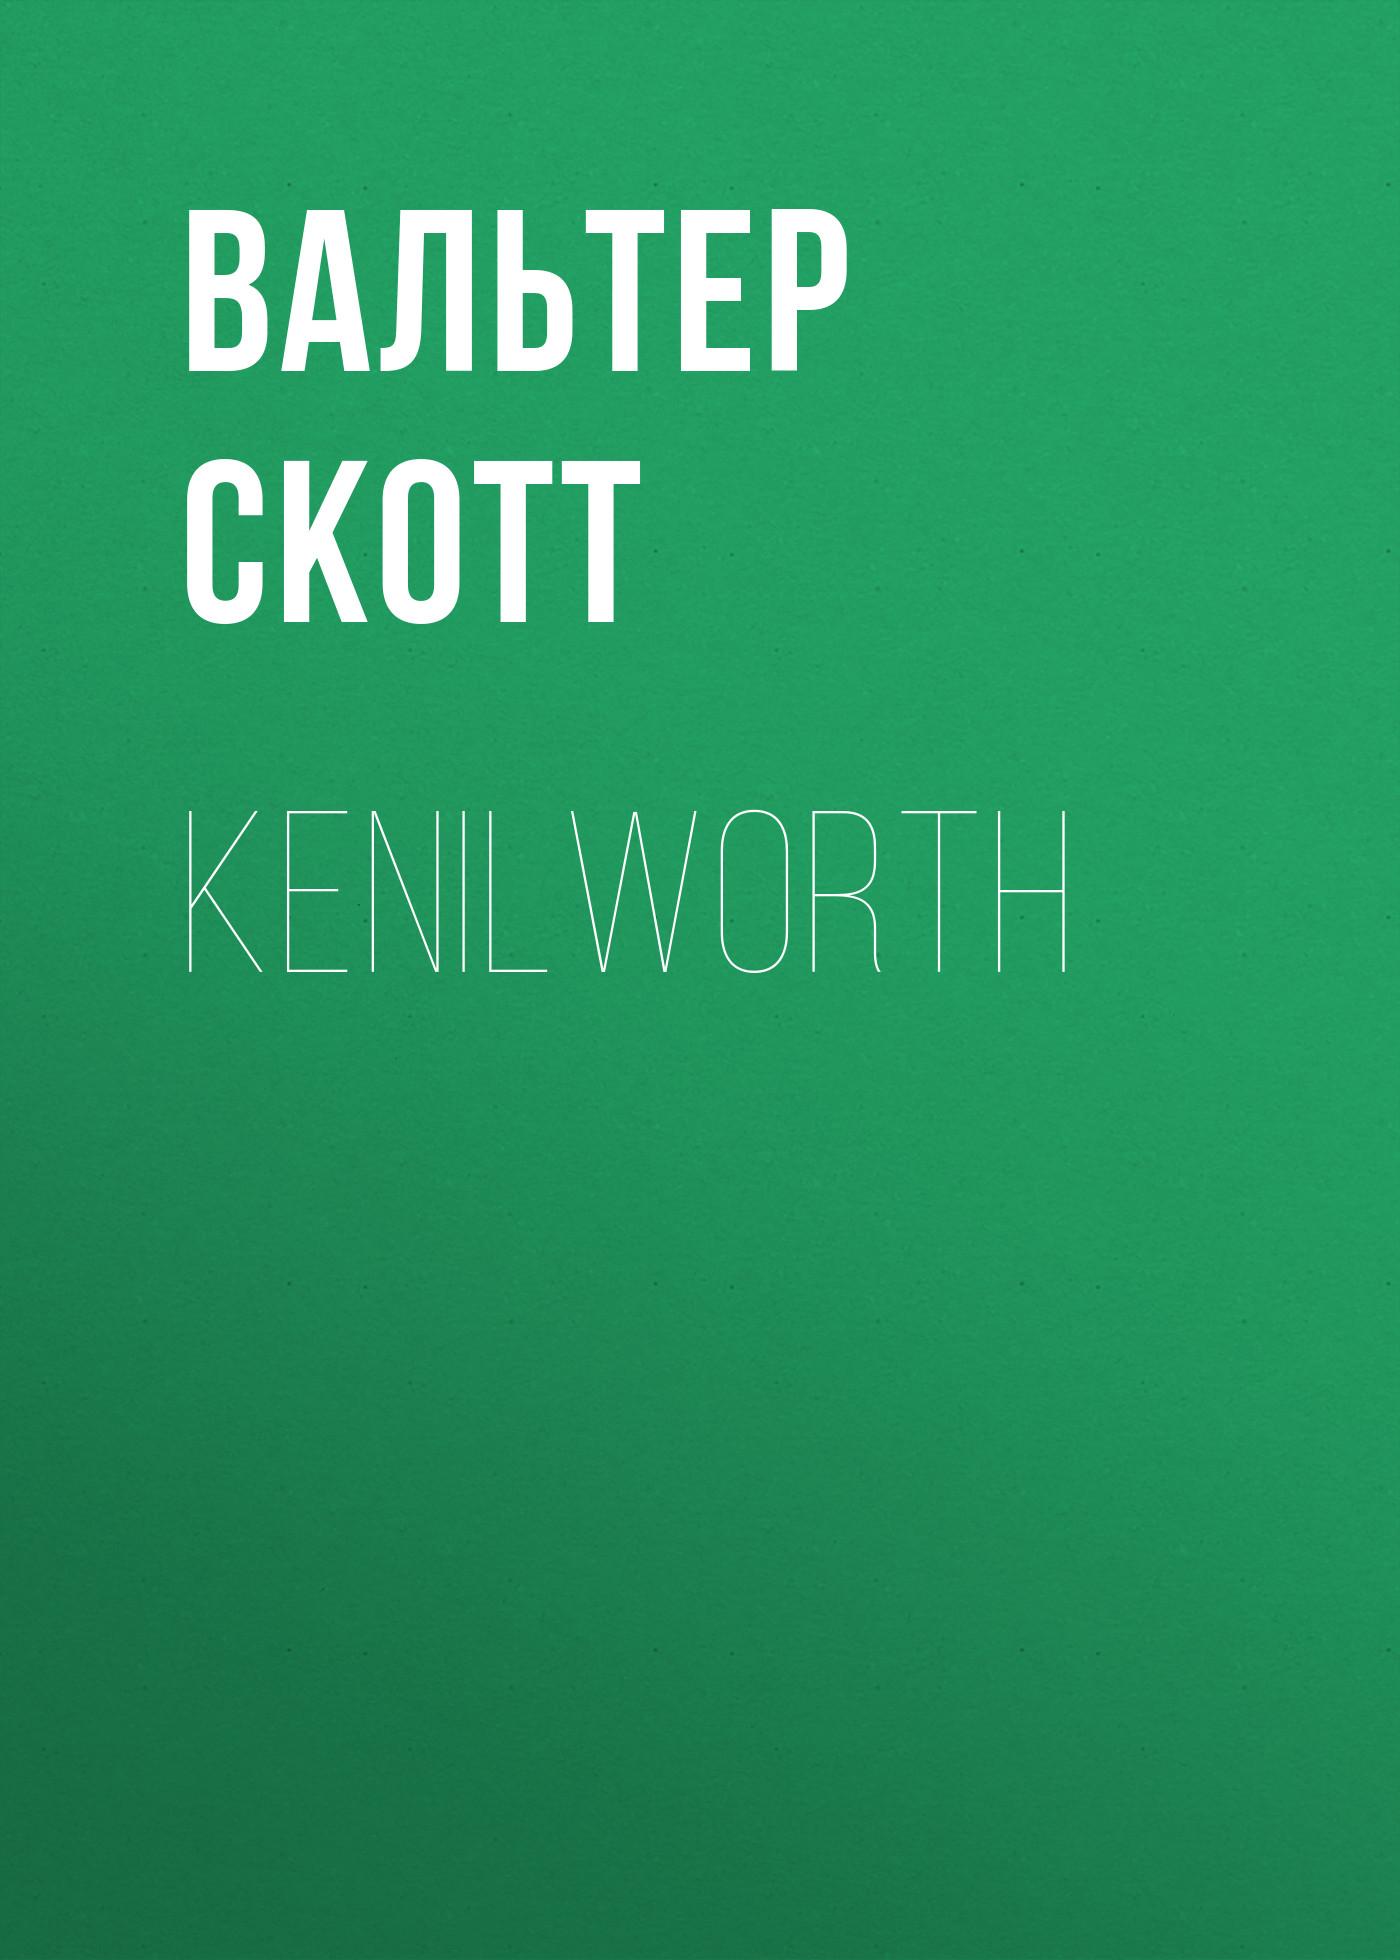 Вальтер Скотт Kenilworth вальтер скотт st ronan s well